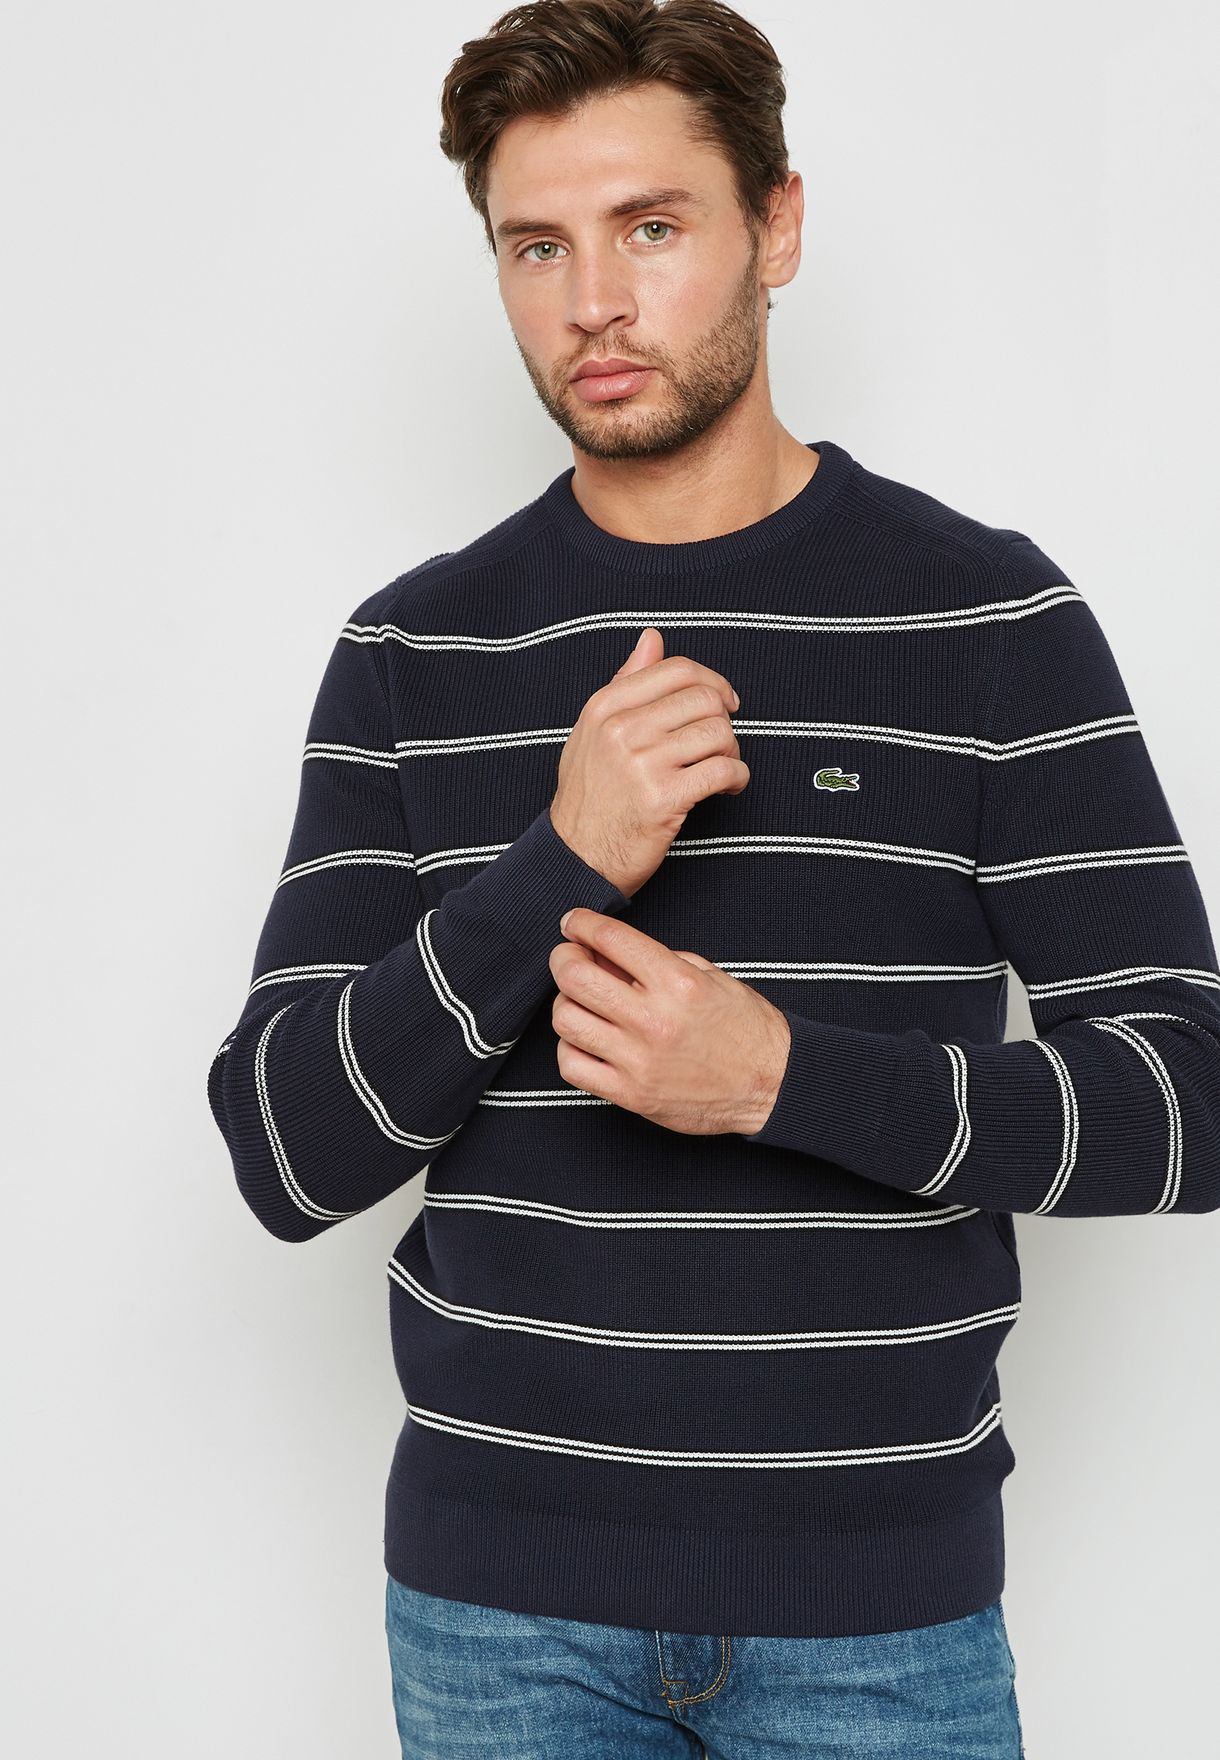 a4936242d7e9 Shop Lacoste stripes Striped Half Cardigan Sweater AH4548-M3T for ...